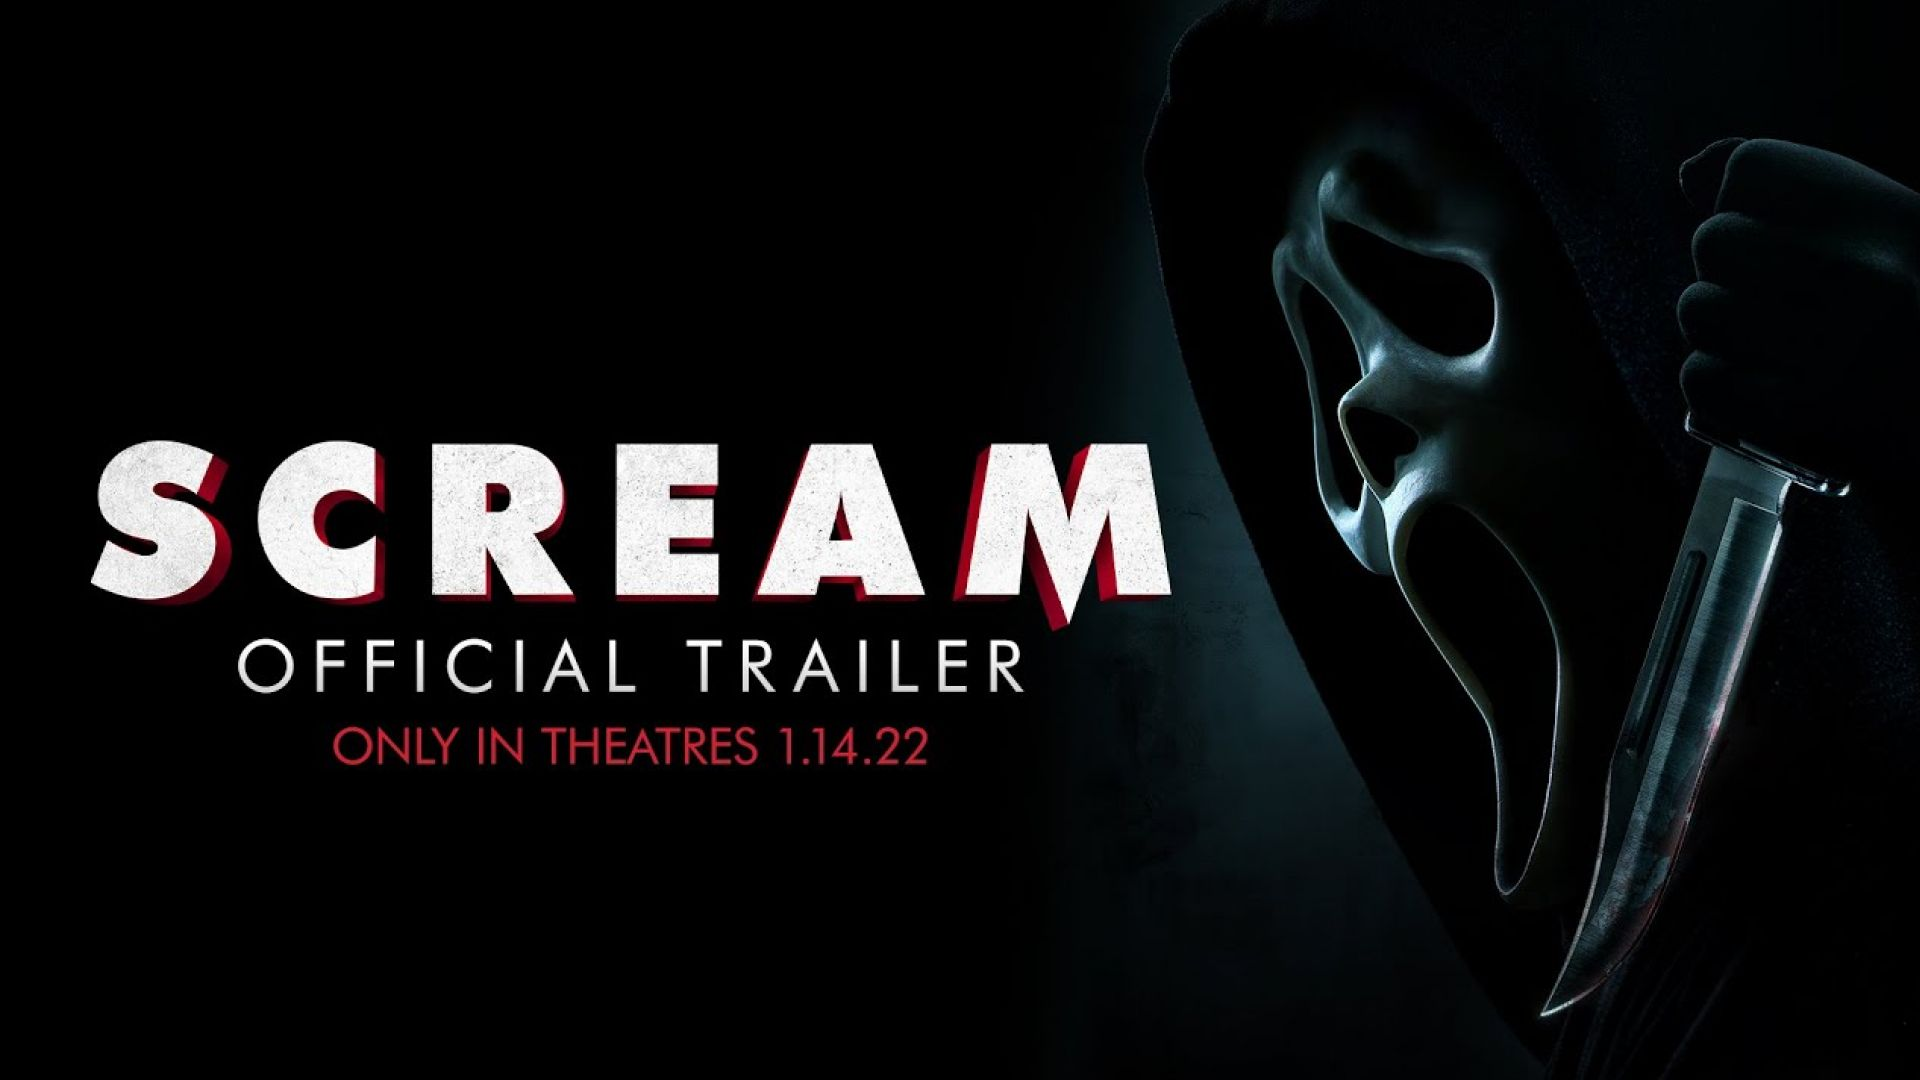 'Scream' Official Trailer